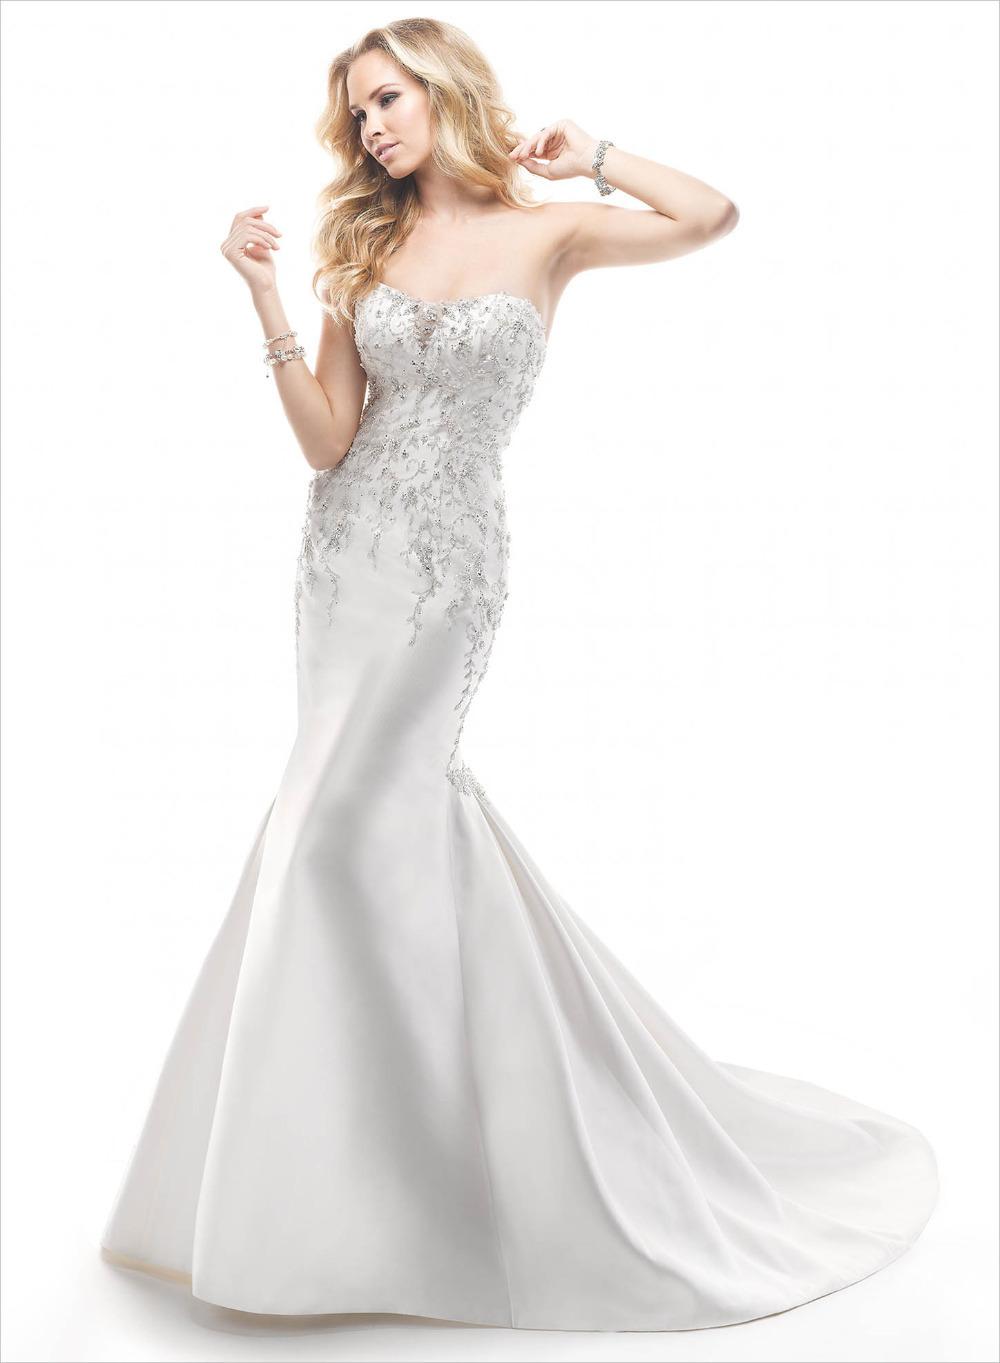 New listing on the 2014 air quality mermaid wedding dress high fashion elegant strapless beaded sleeveless(China (Mainland))